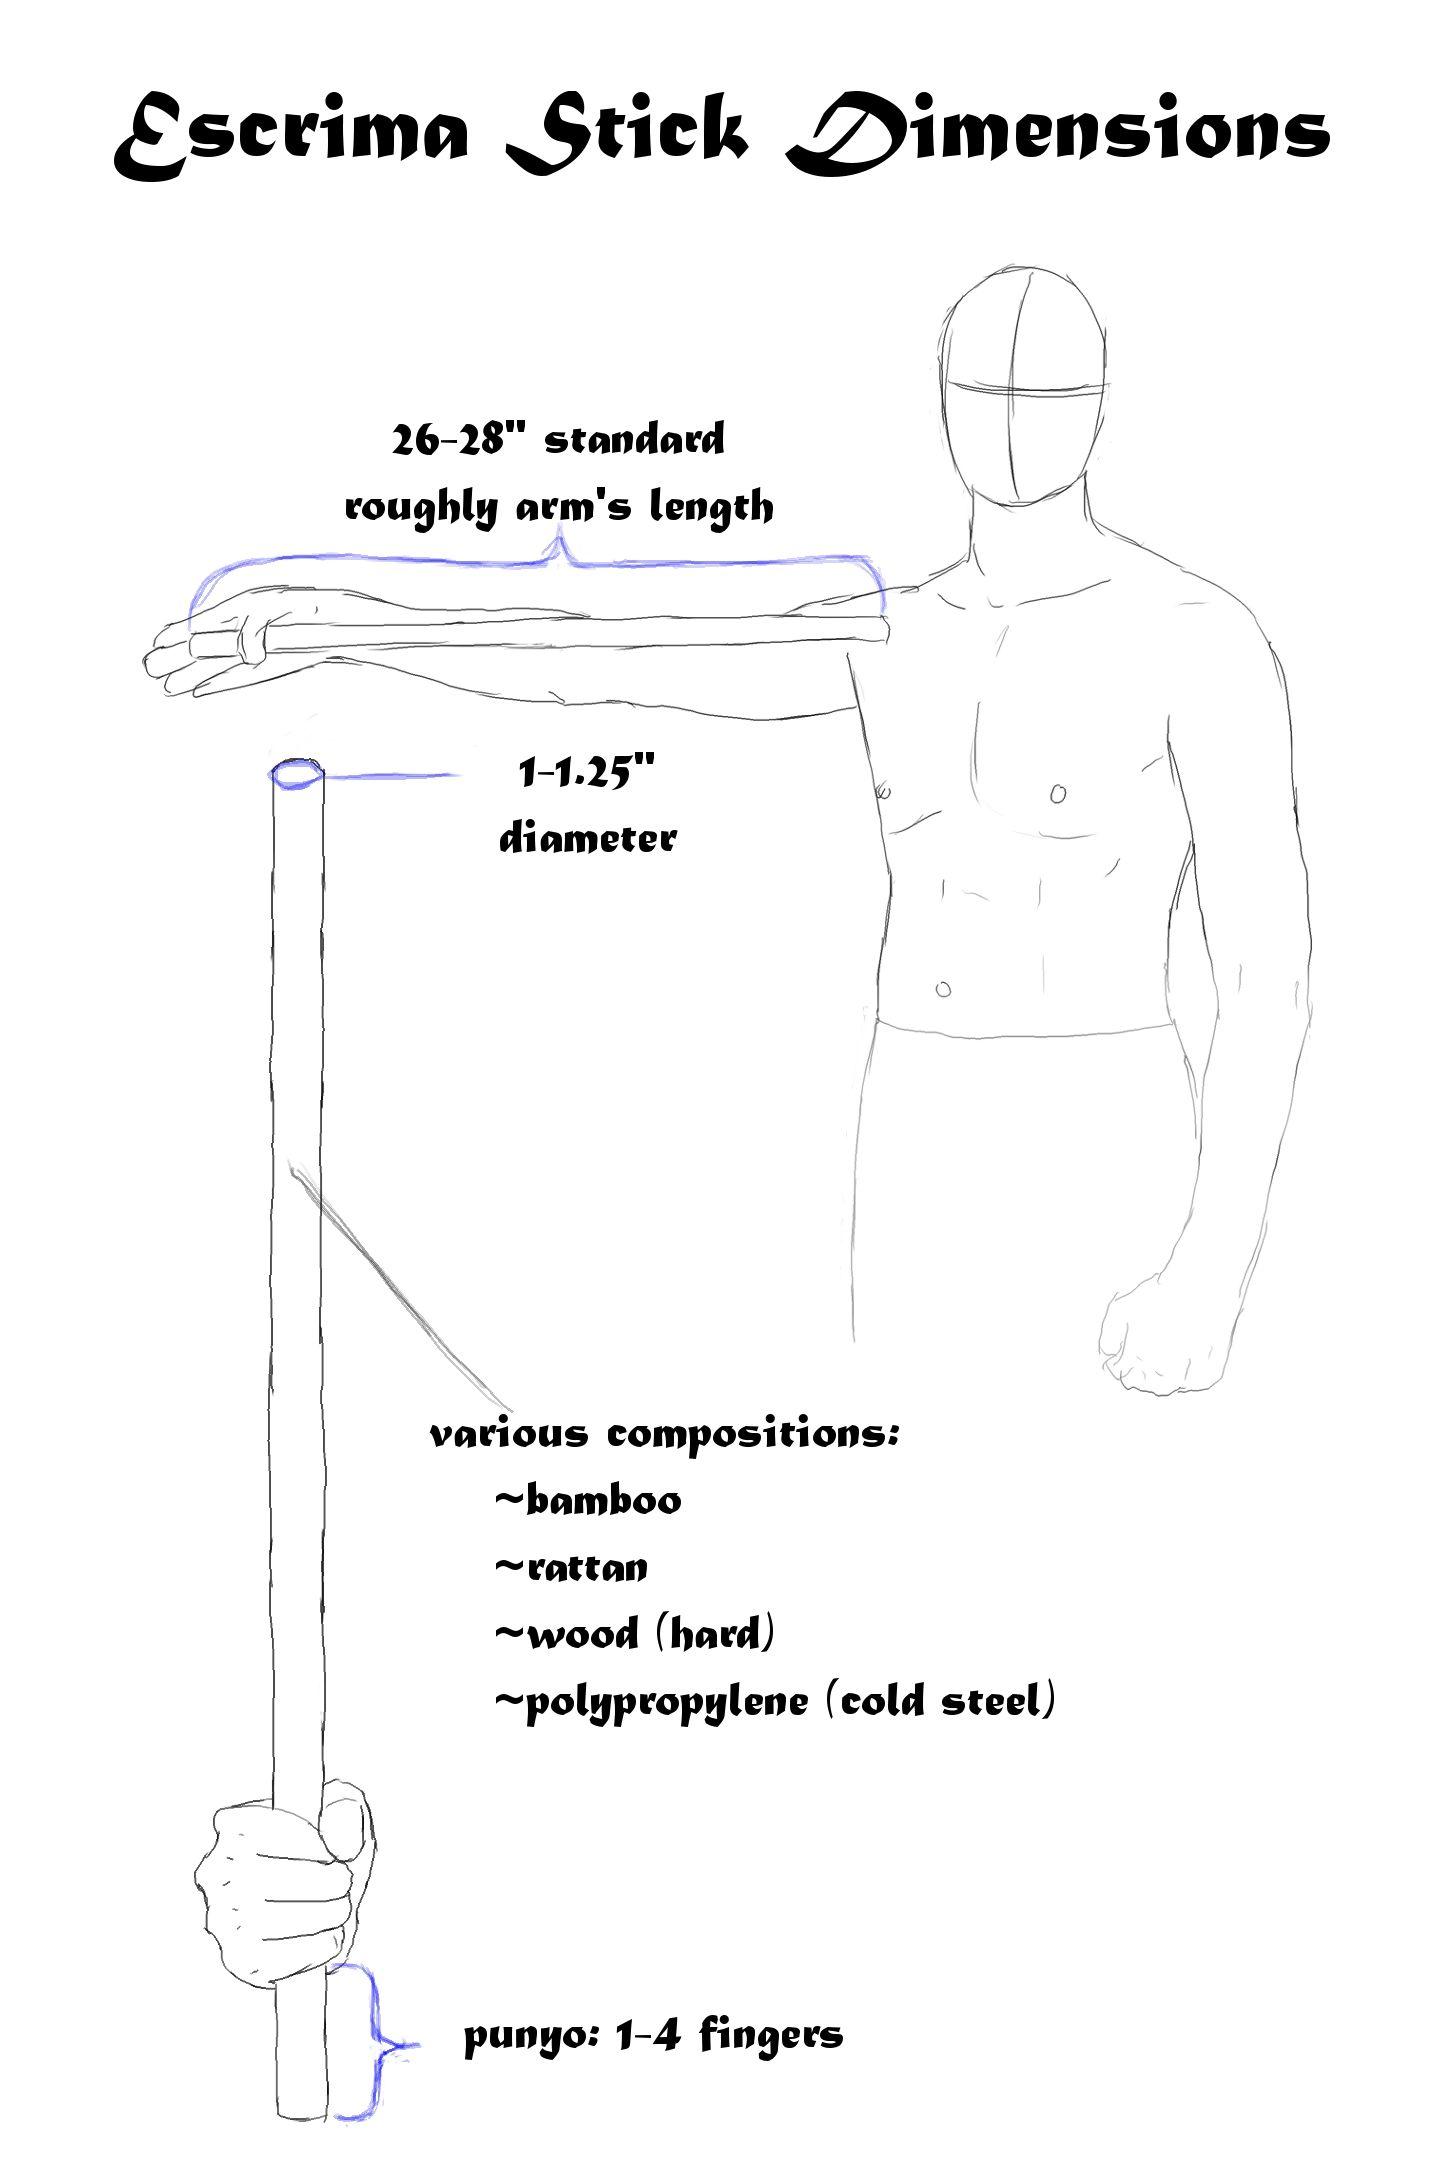 martial arts diagram jeep cj2a wiring escrima stick dimensions karaté 43 pinterest